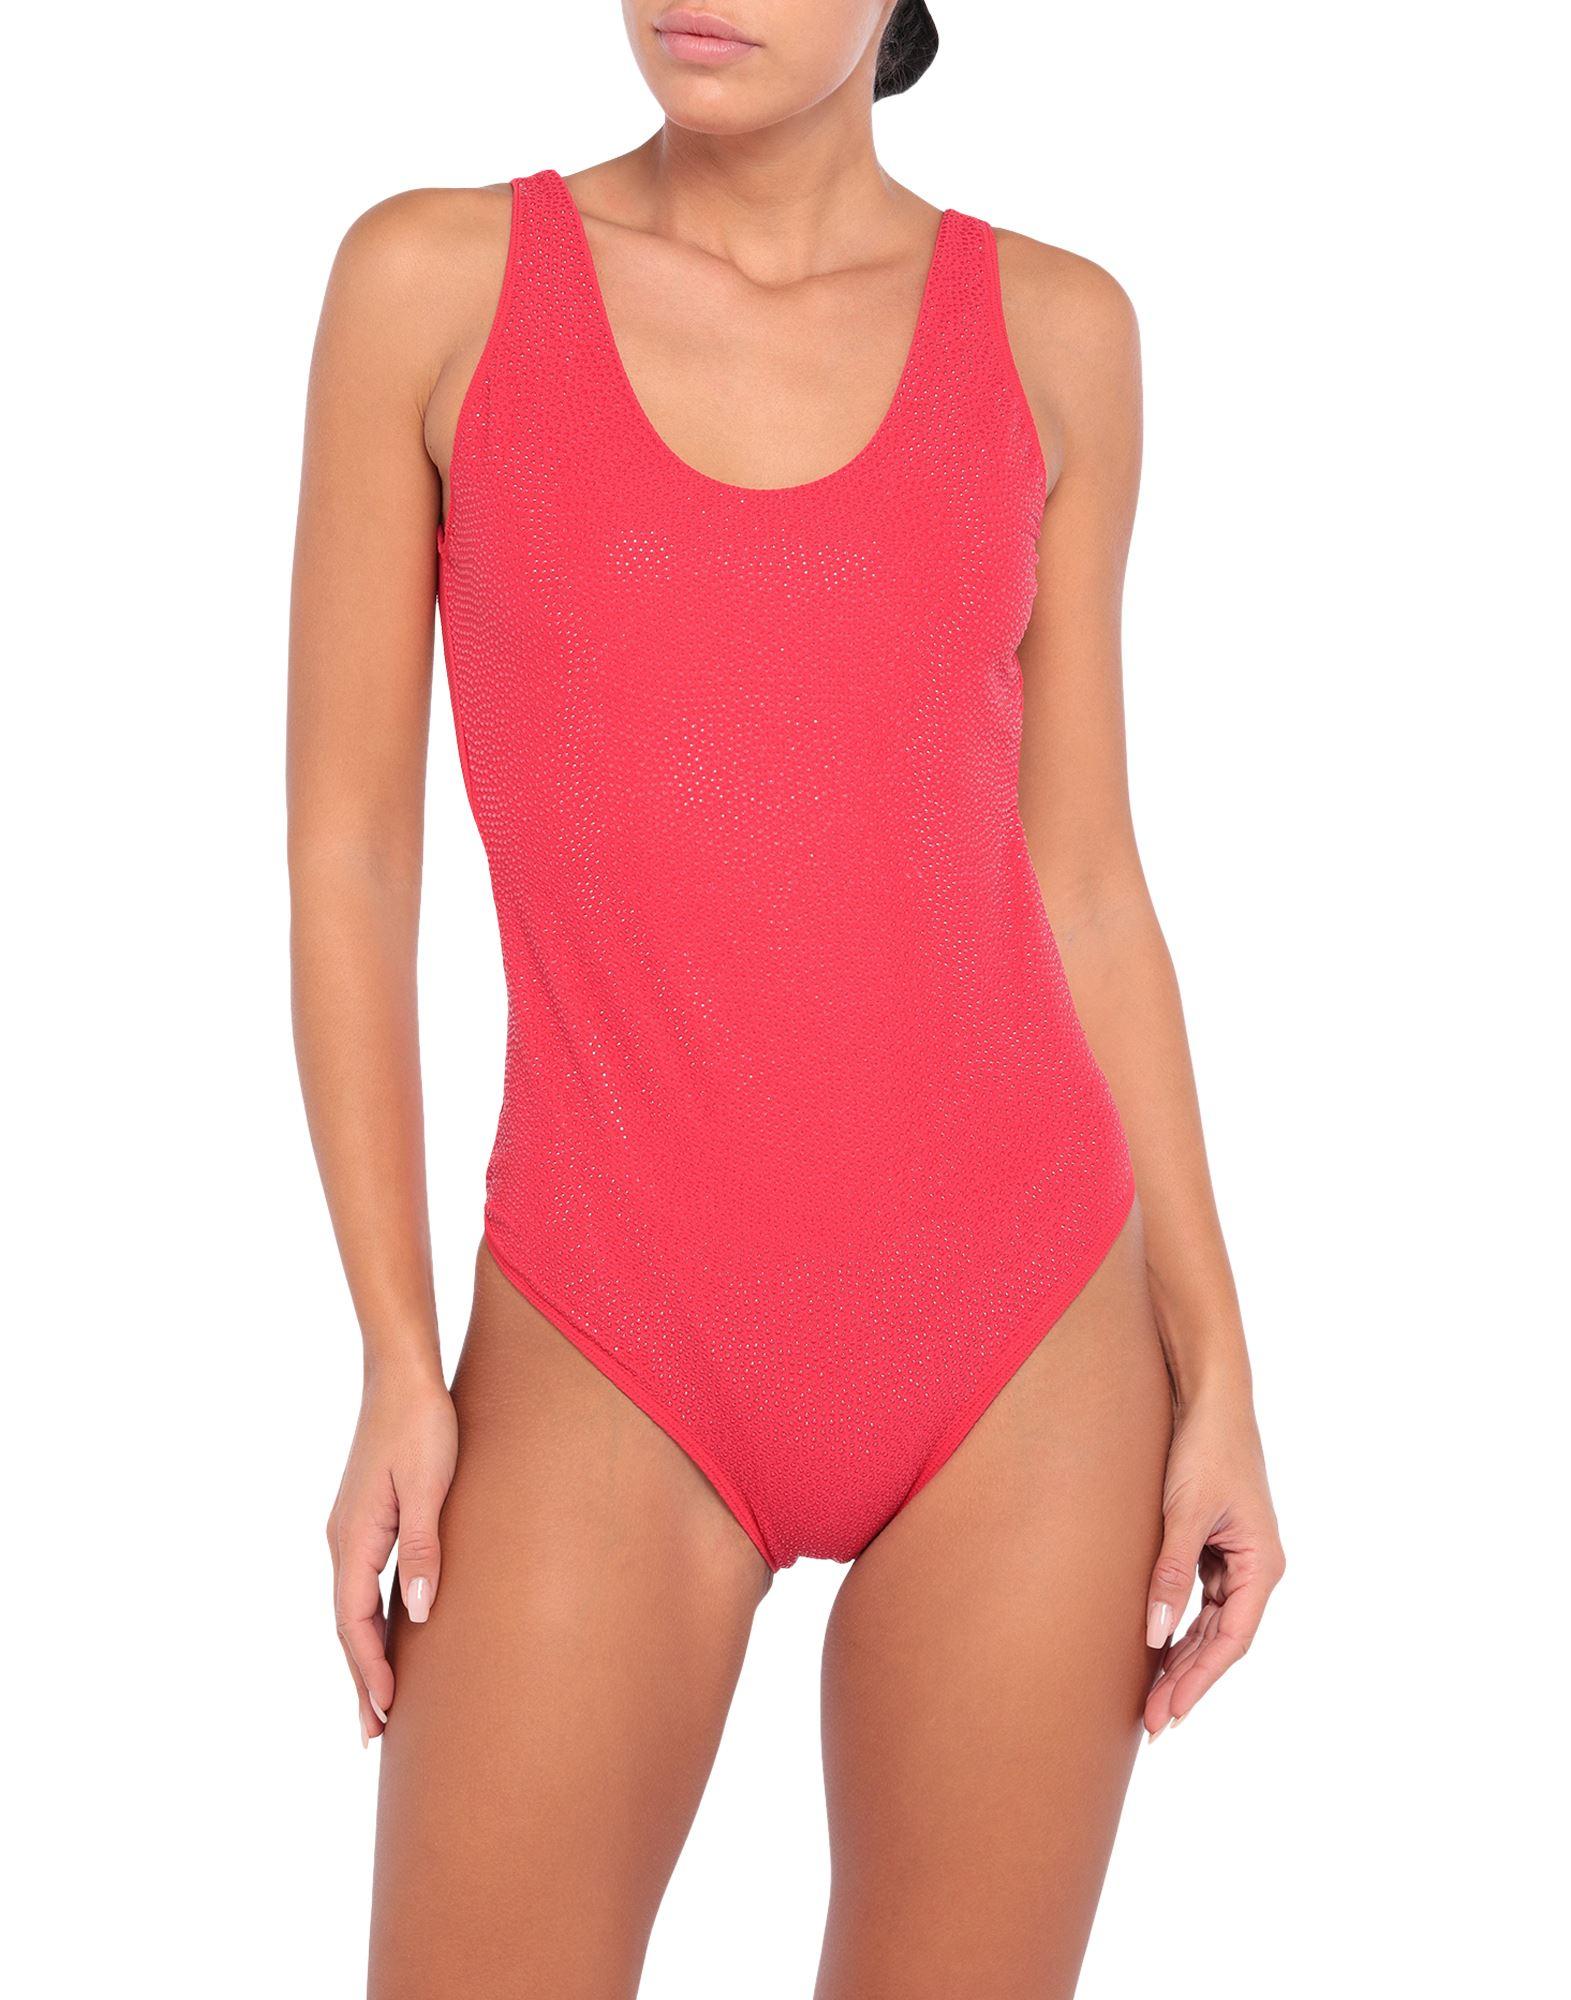 ERMANNO SCERVINO BEACHWEAR Слитный купальник ermanno scervino beachwear бикини